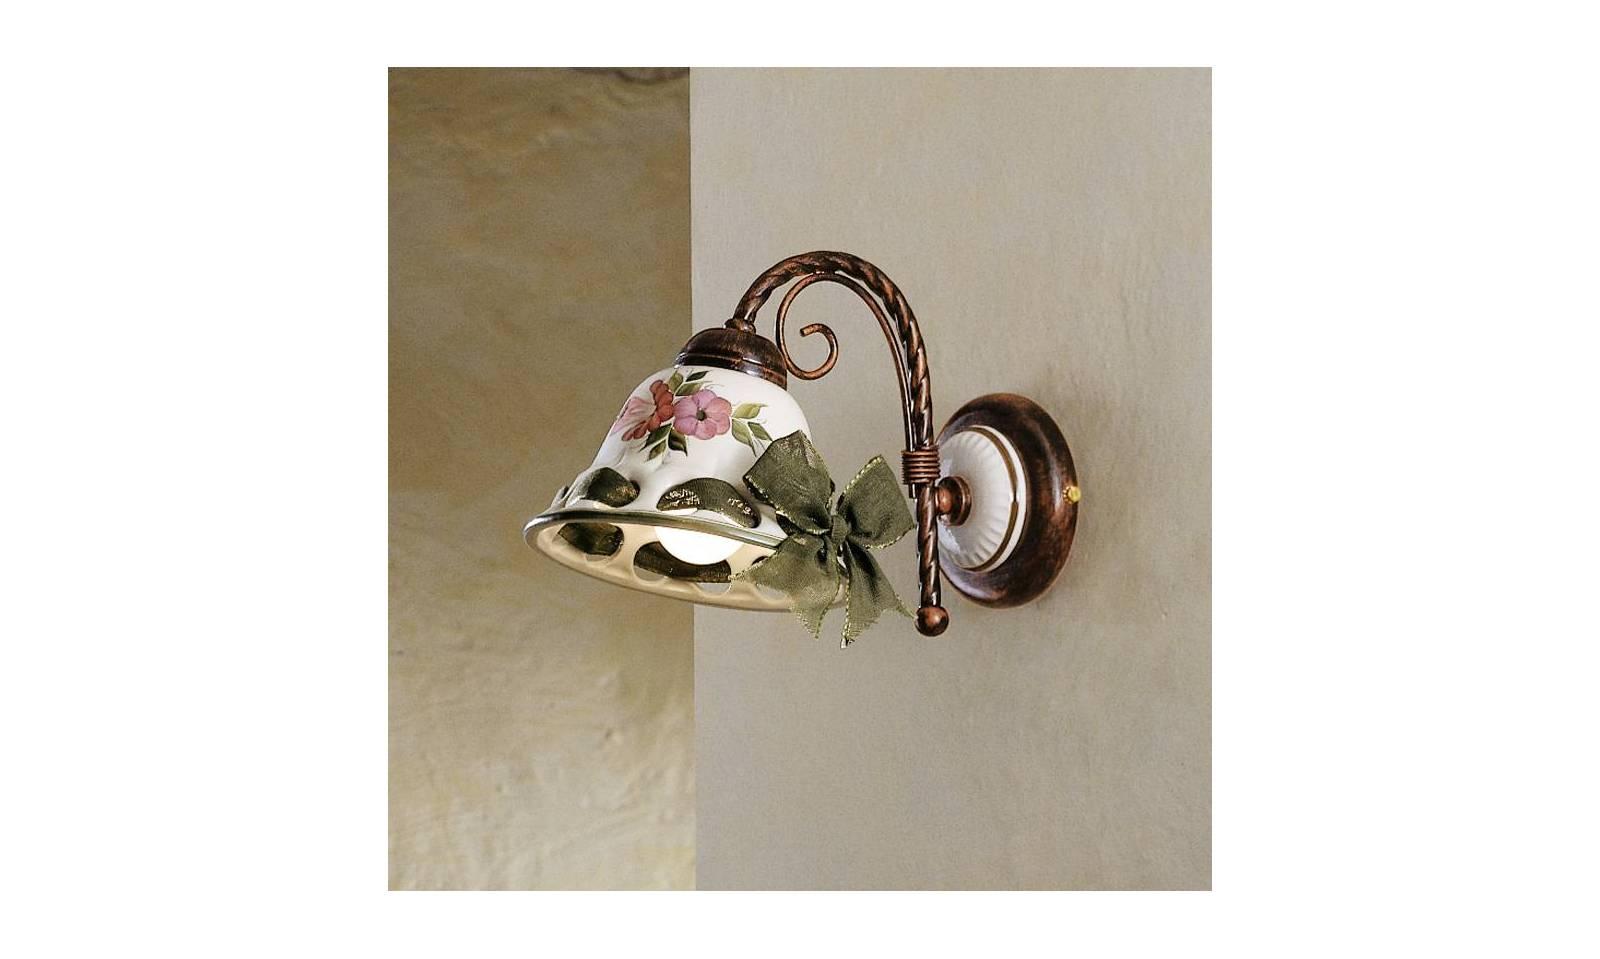 Ferroluce applique rustico in ceramica serie napoli Ø cm